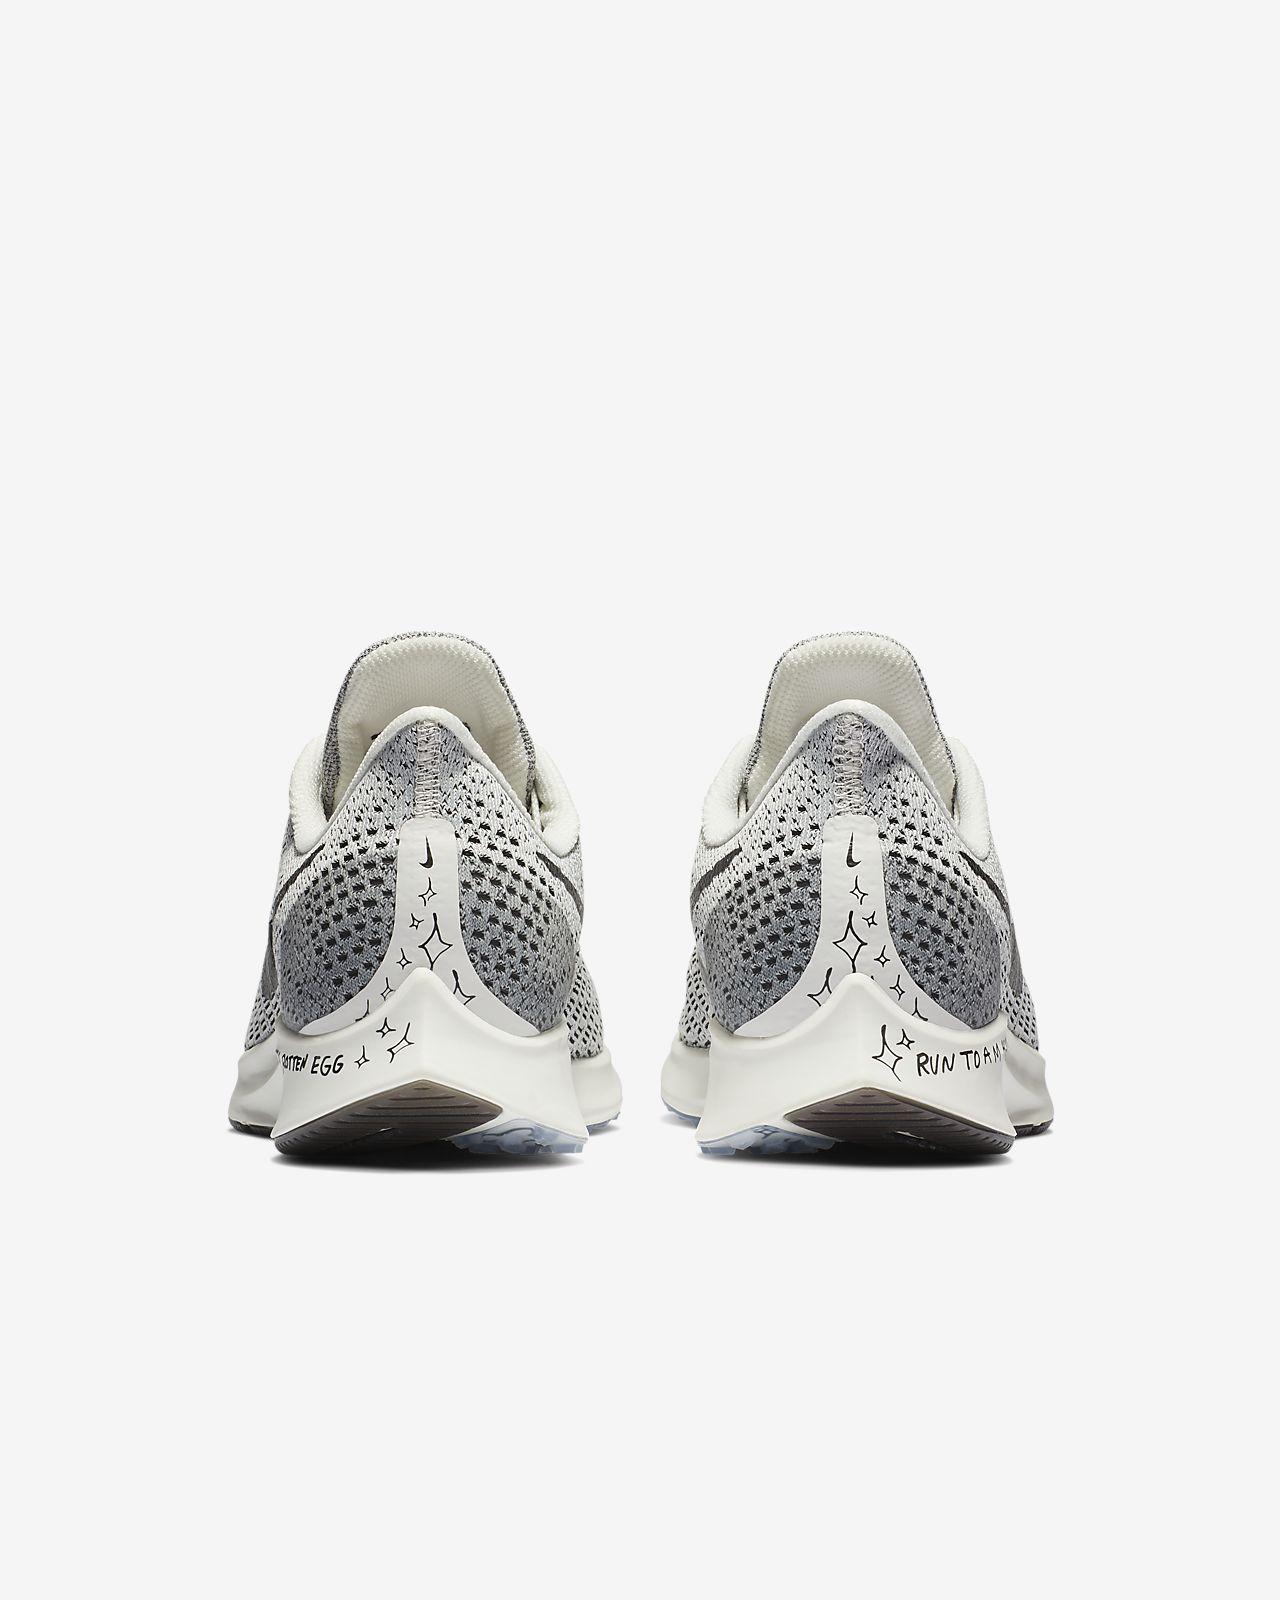 wholesale dealer 4c095 d3edd Pegasus Zoom Nike Nathan Bell Air Menneskesko 35 STTqErgw4